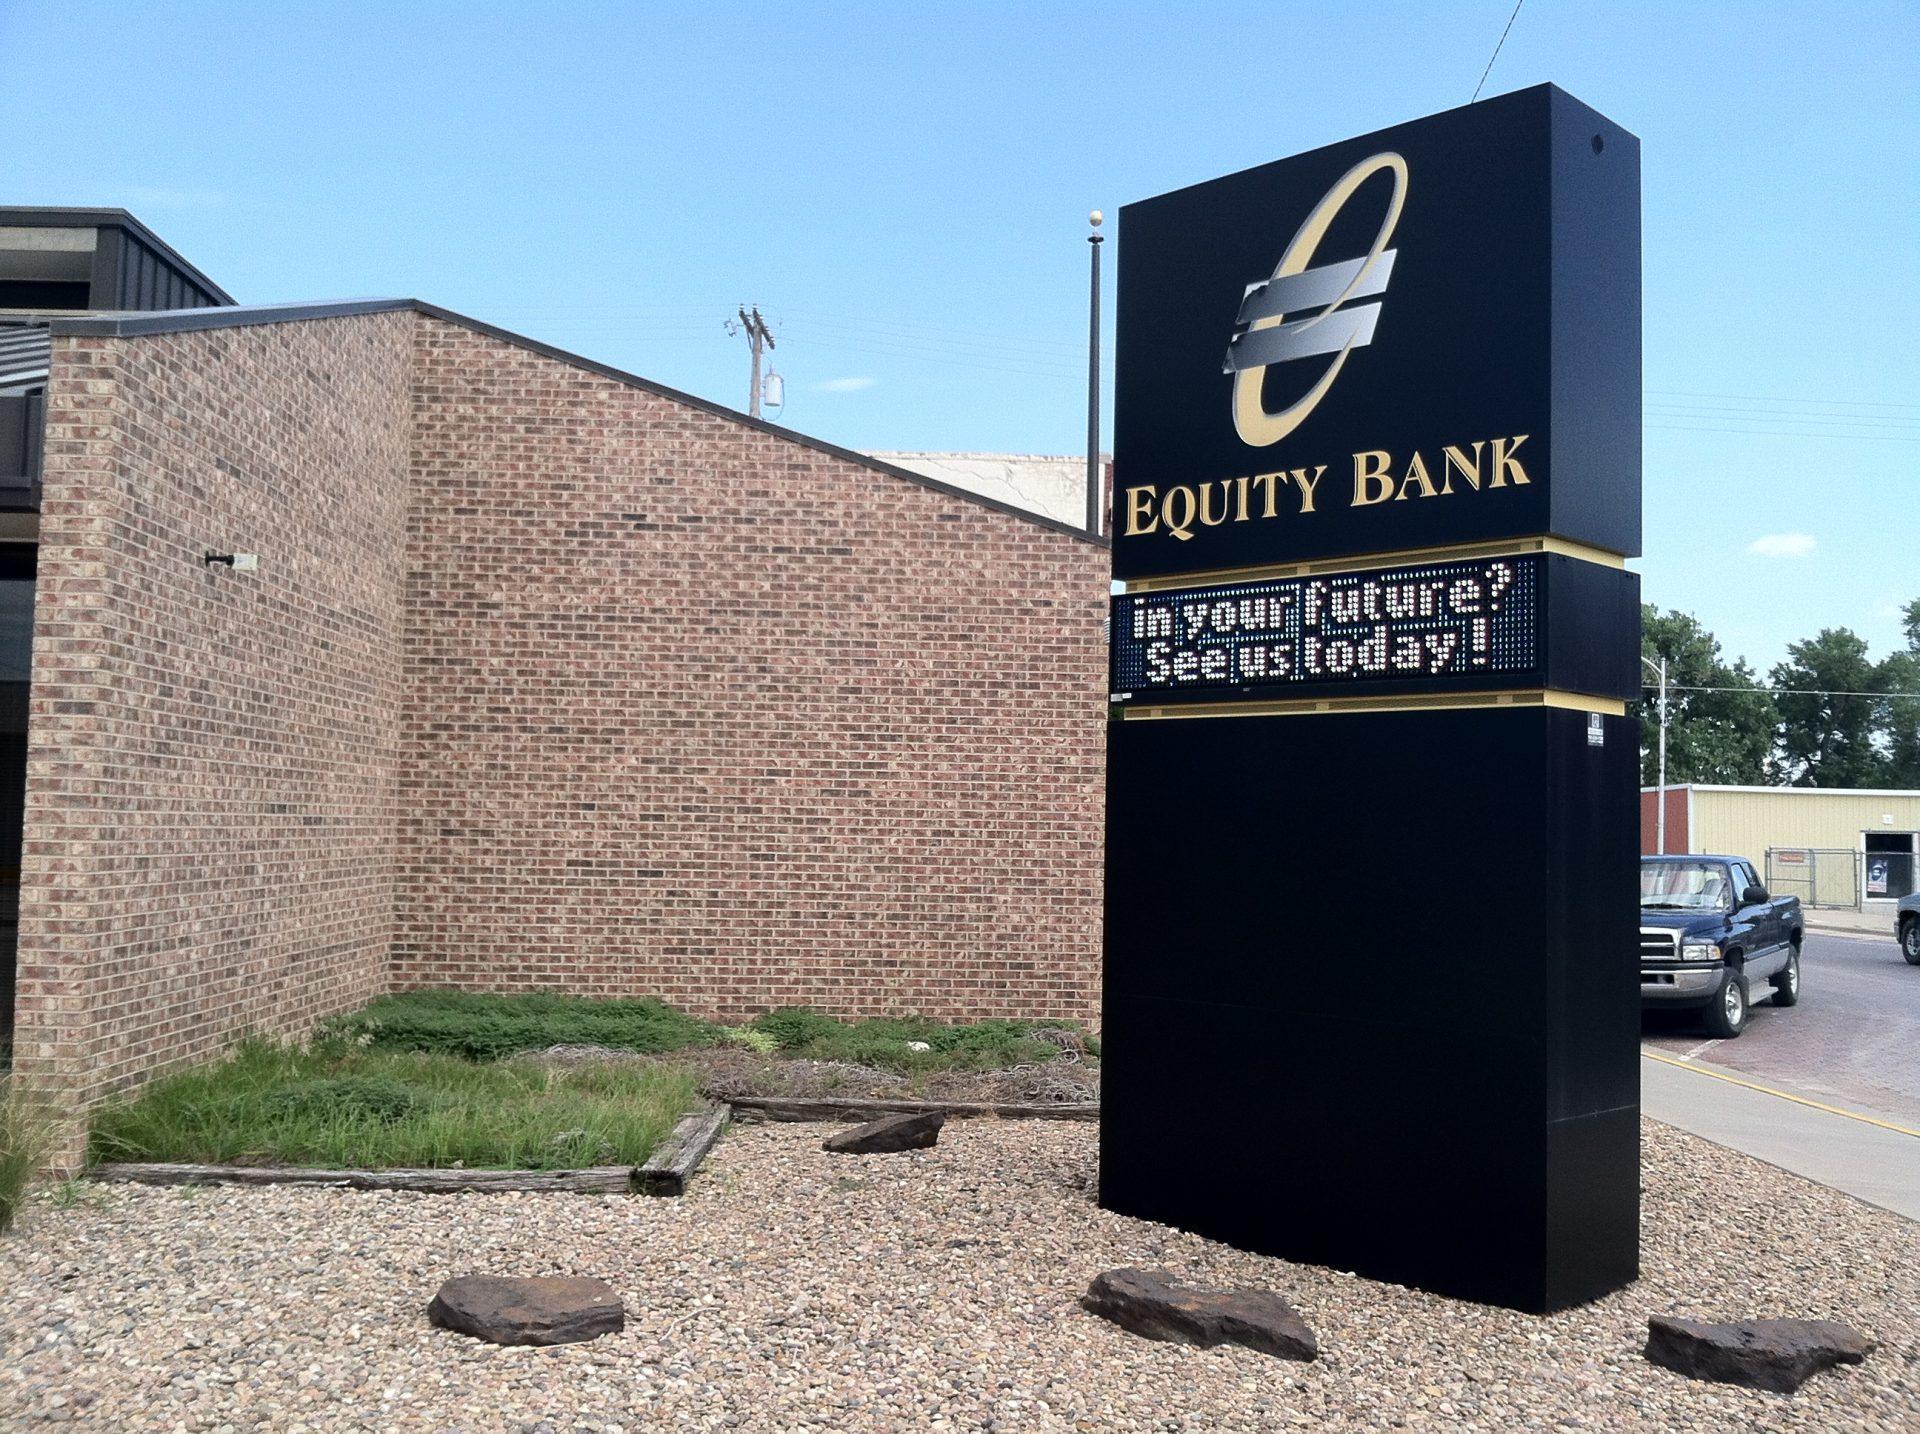 Equity Bank Ellis branch exterior.